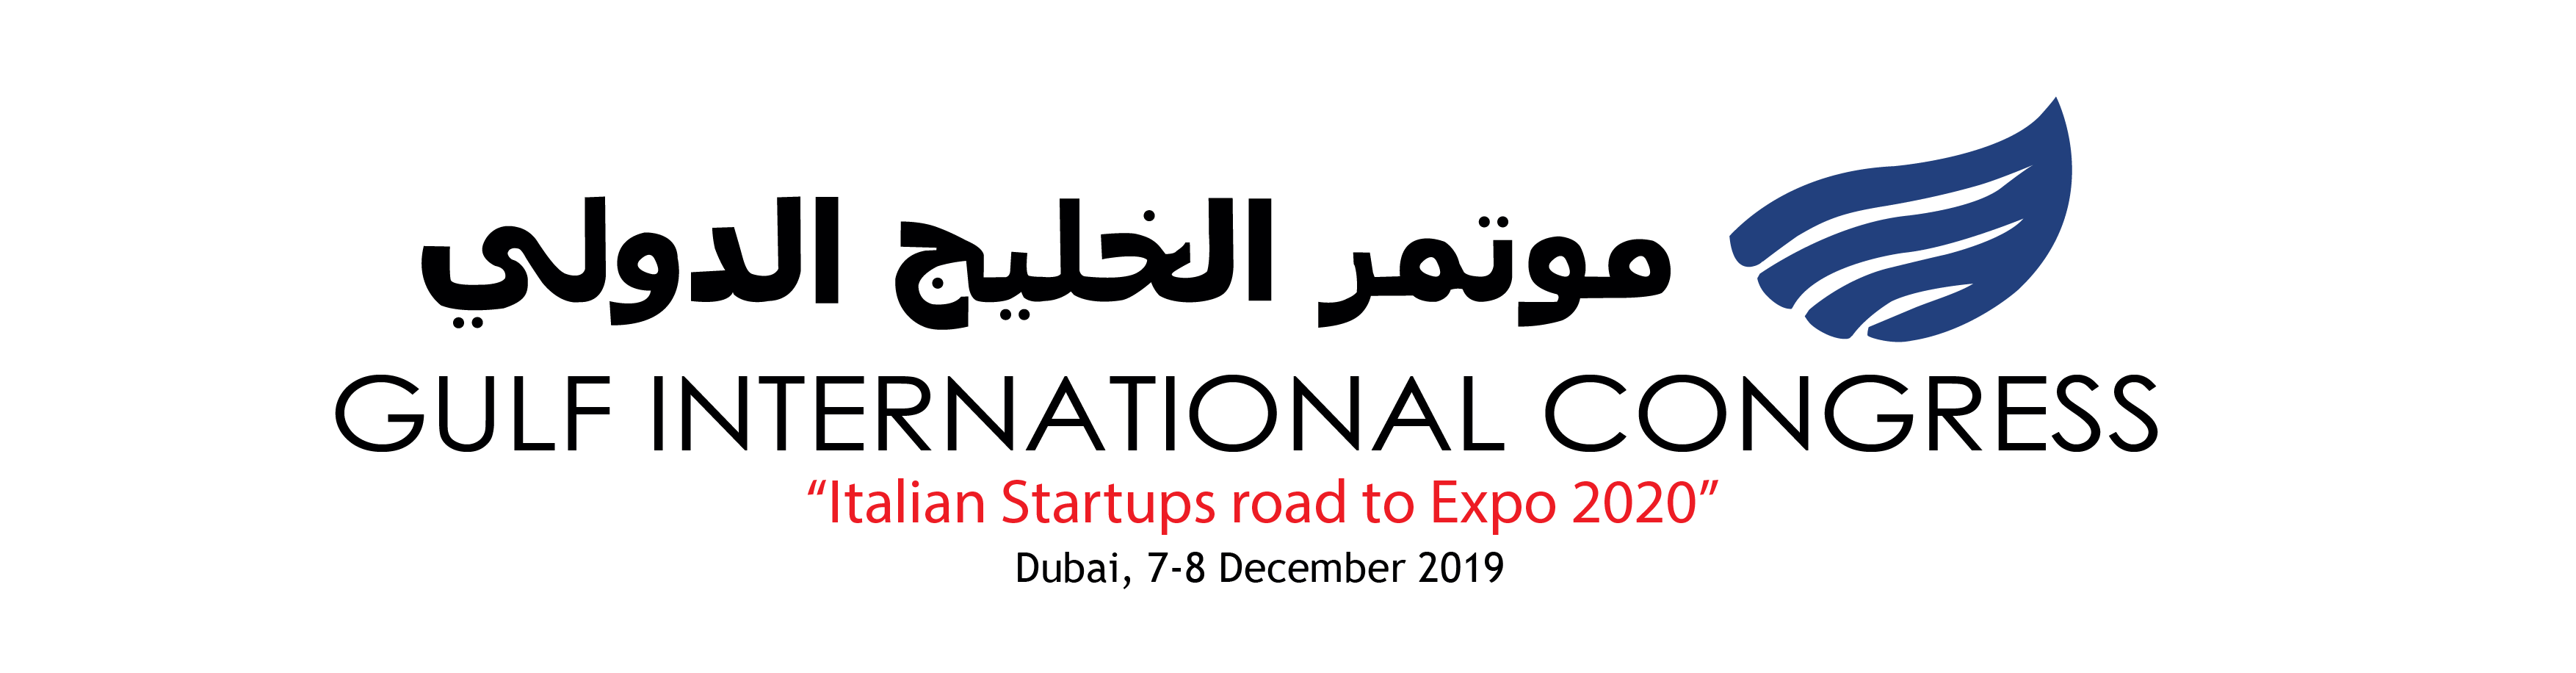 Gulf International Congress